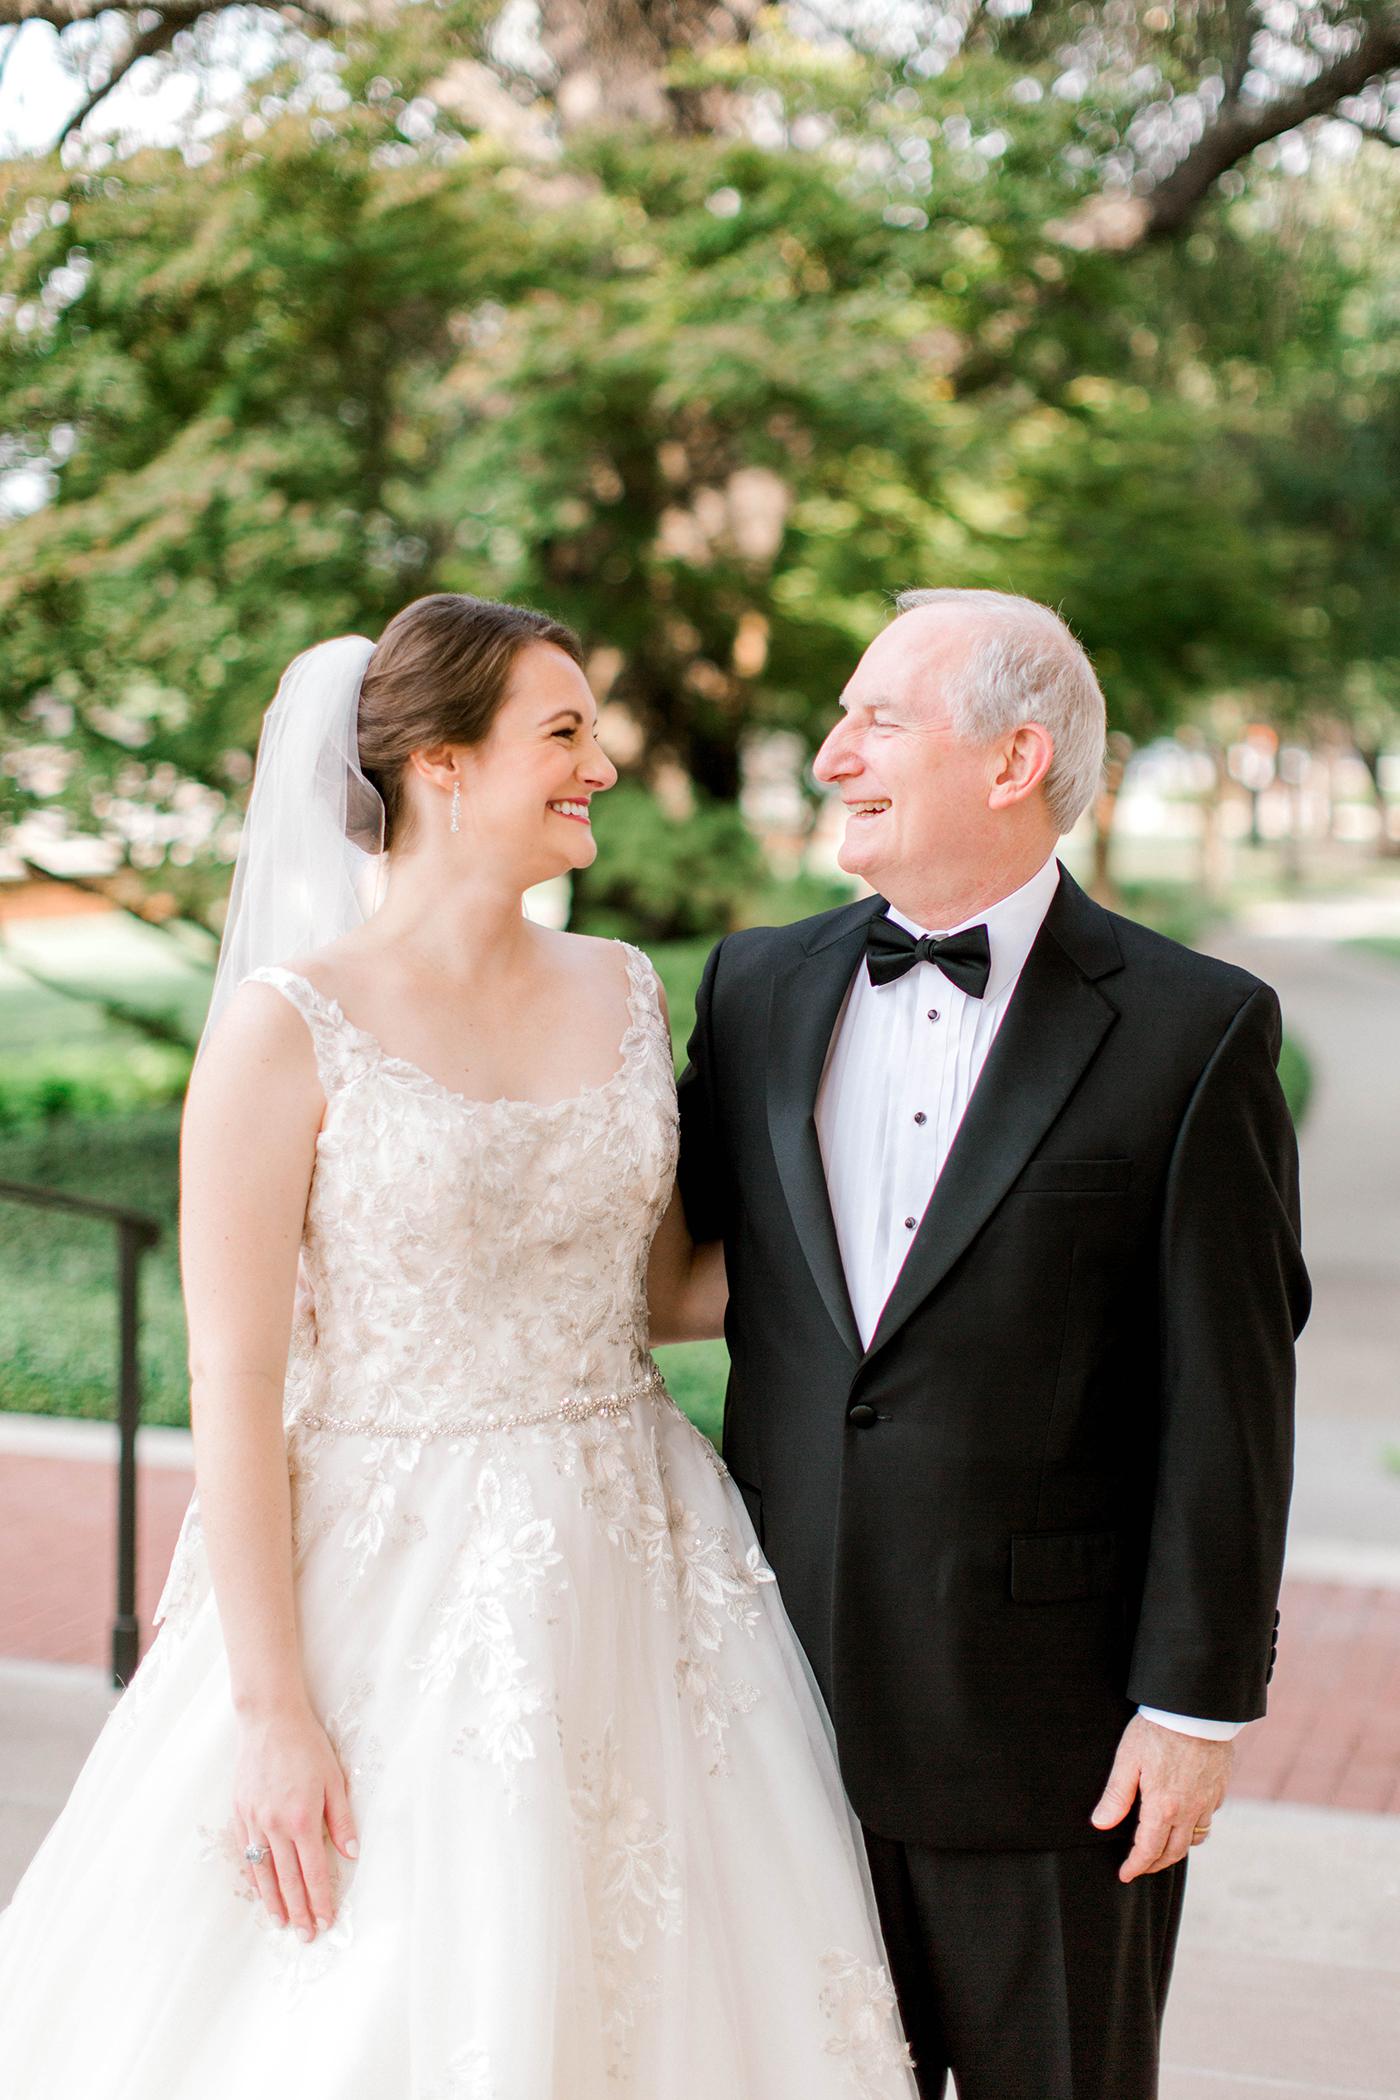 Dallas TX Wedding Planner - Allday Events - Hall on Dragon Wedding - 00029.jpg